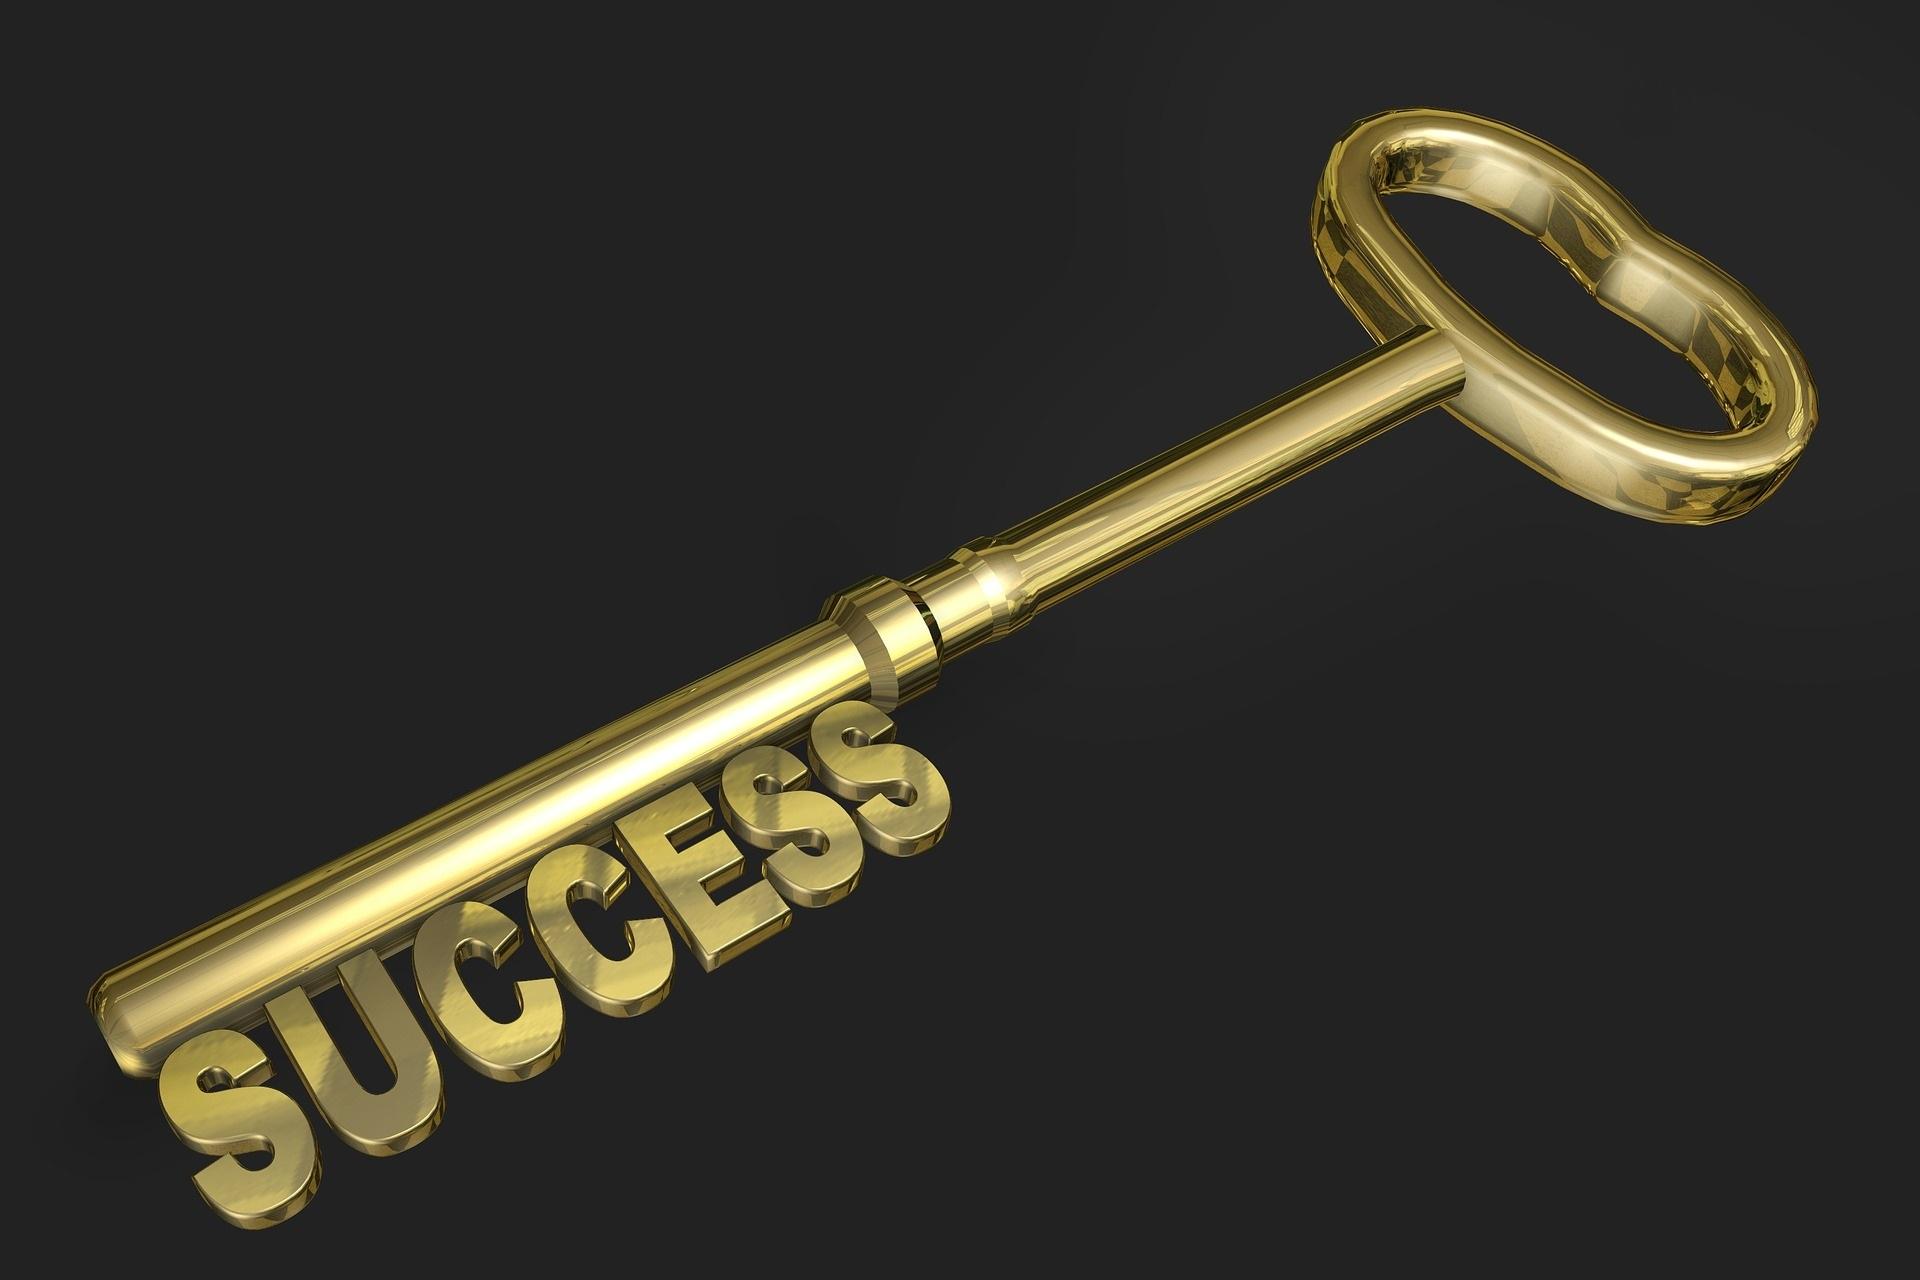 success-1433400_1920.jpg